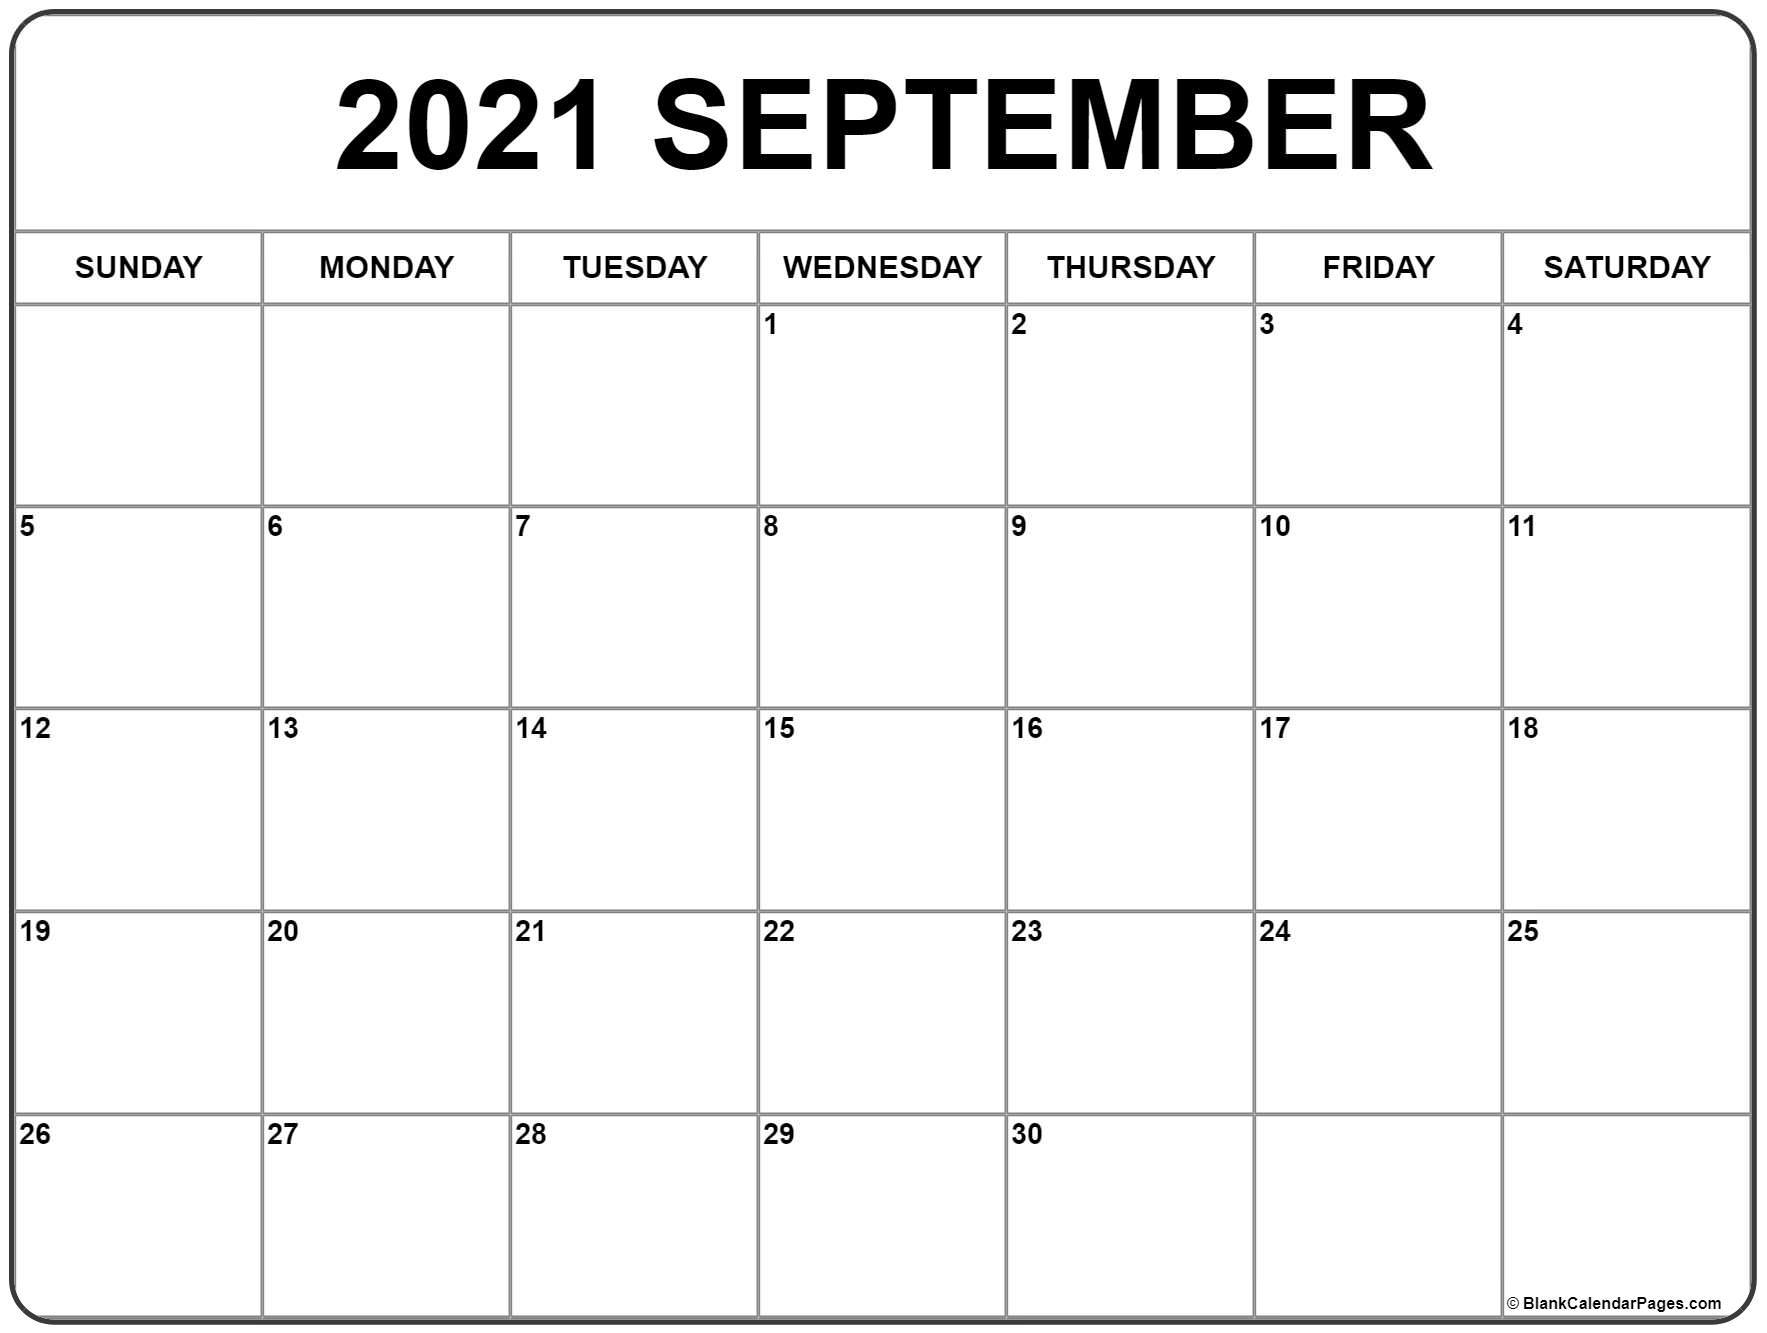 September 2021 Calendar | Free Printable Monthly Calendars pertaining to September 2021 Calendar Printable